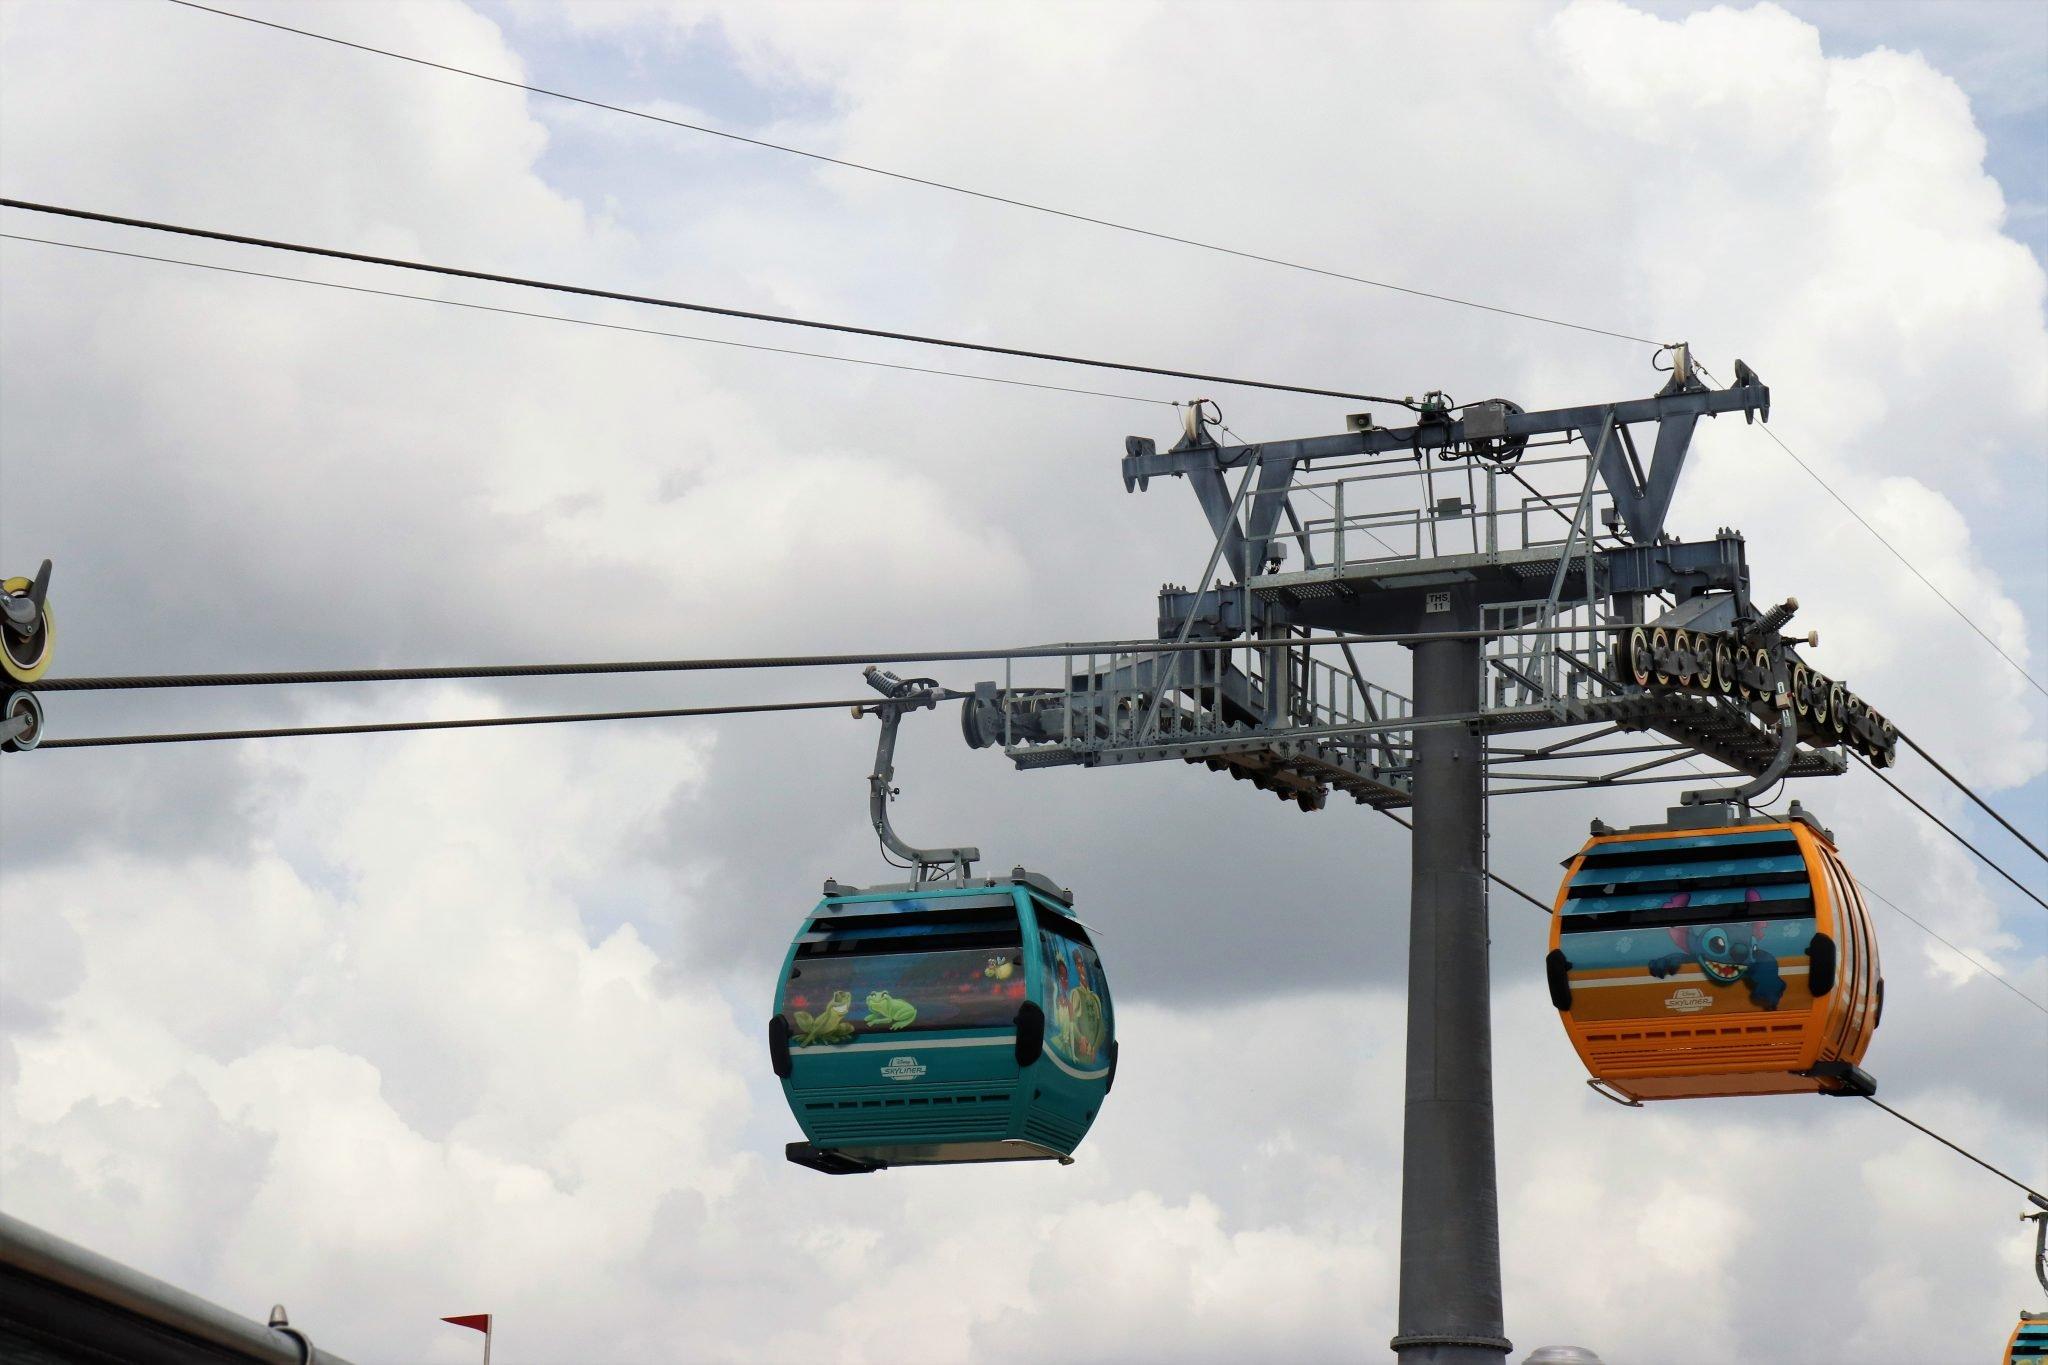 Disney transportation skyliner - Disney in your Day